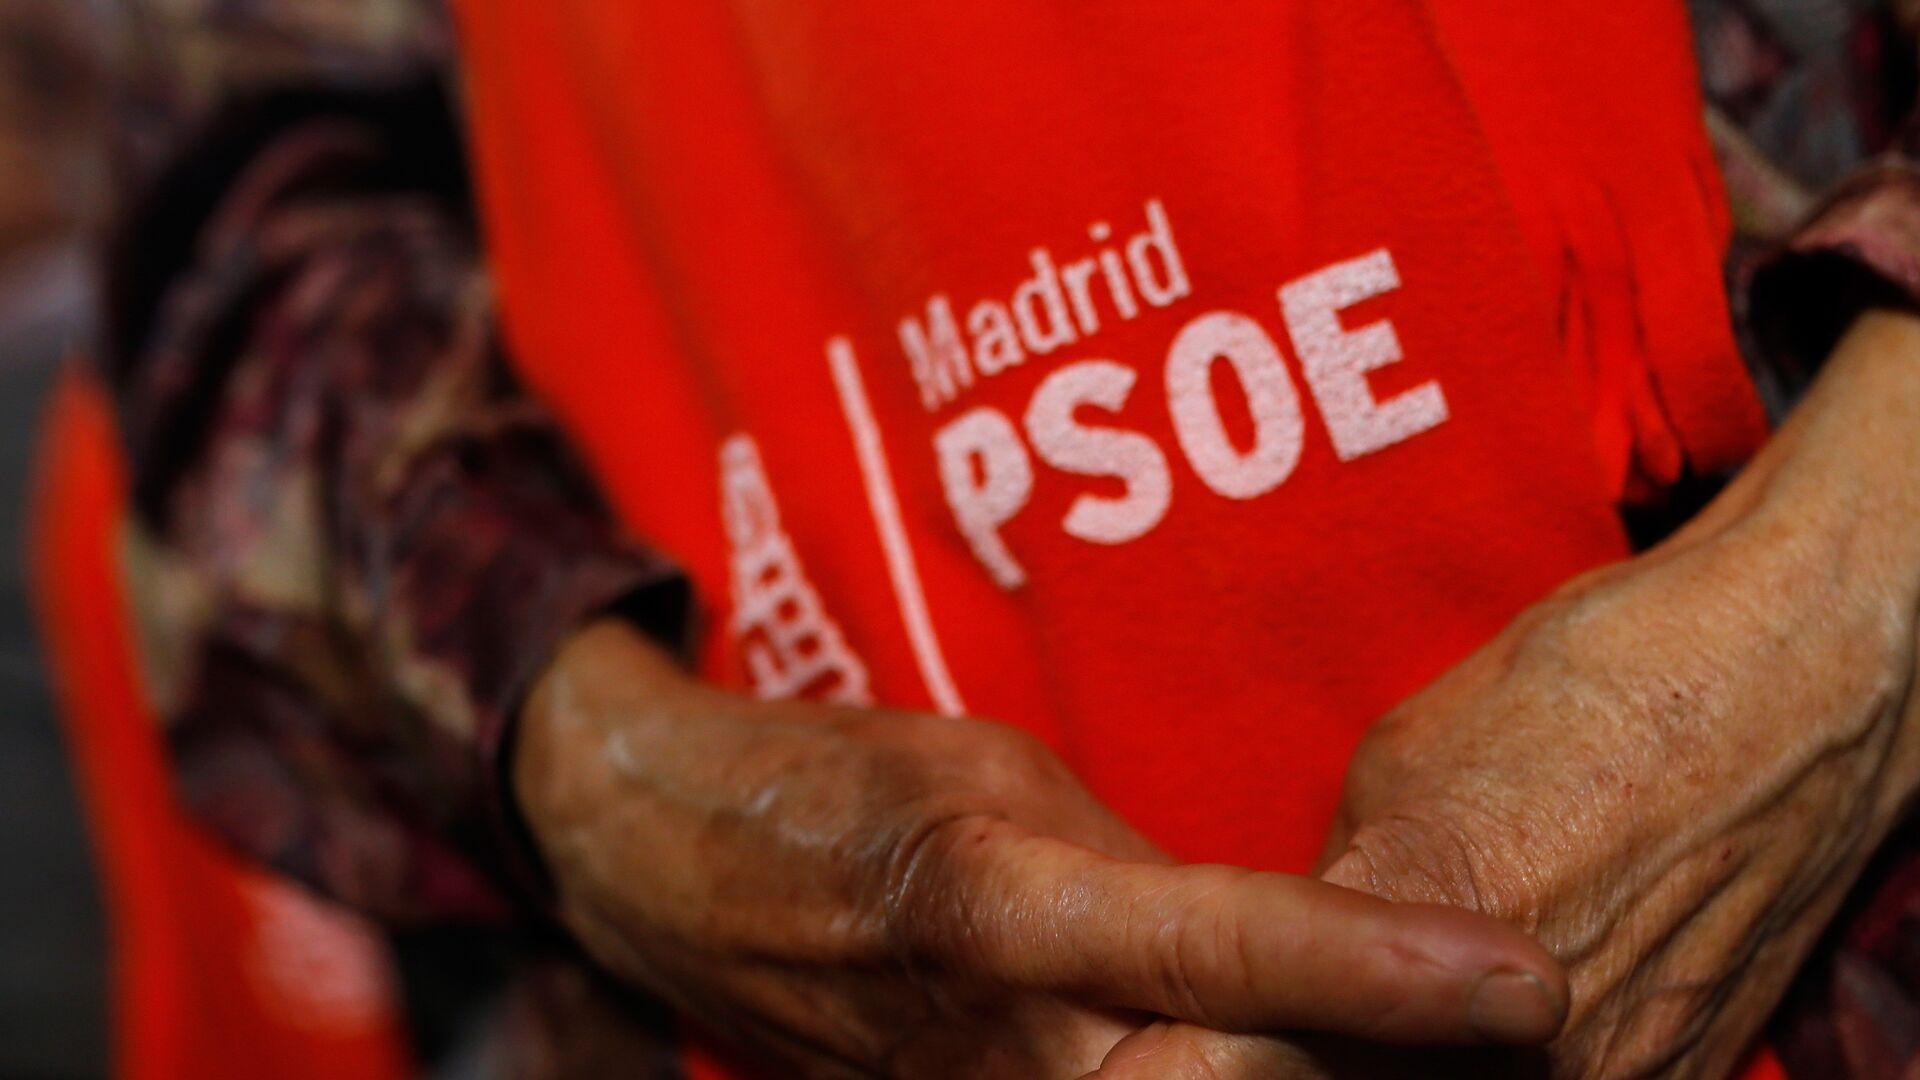 Seguidores del PSOE - Sputnik Mundo, 1920, 27.05.2021